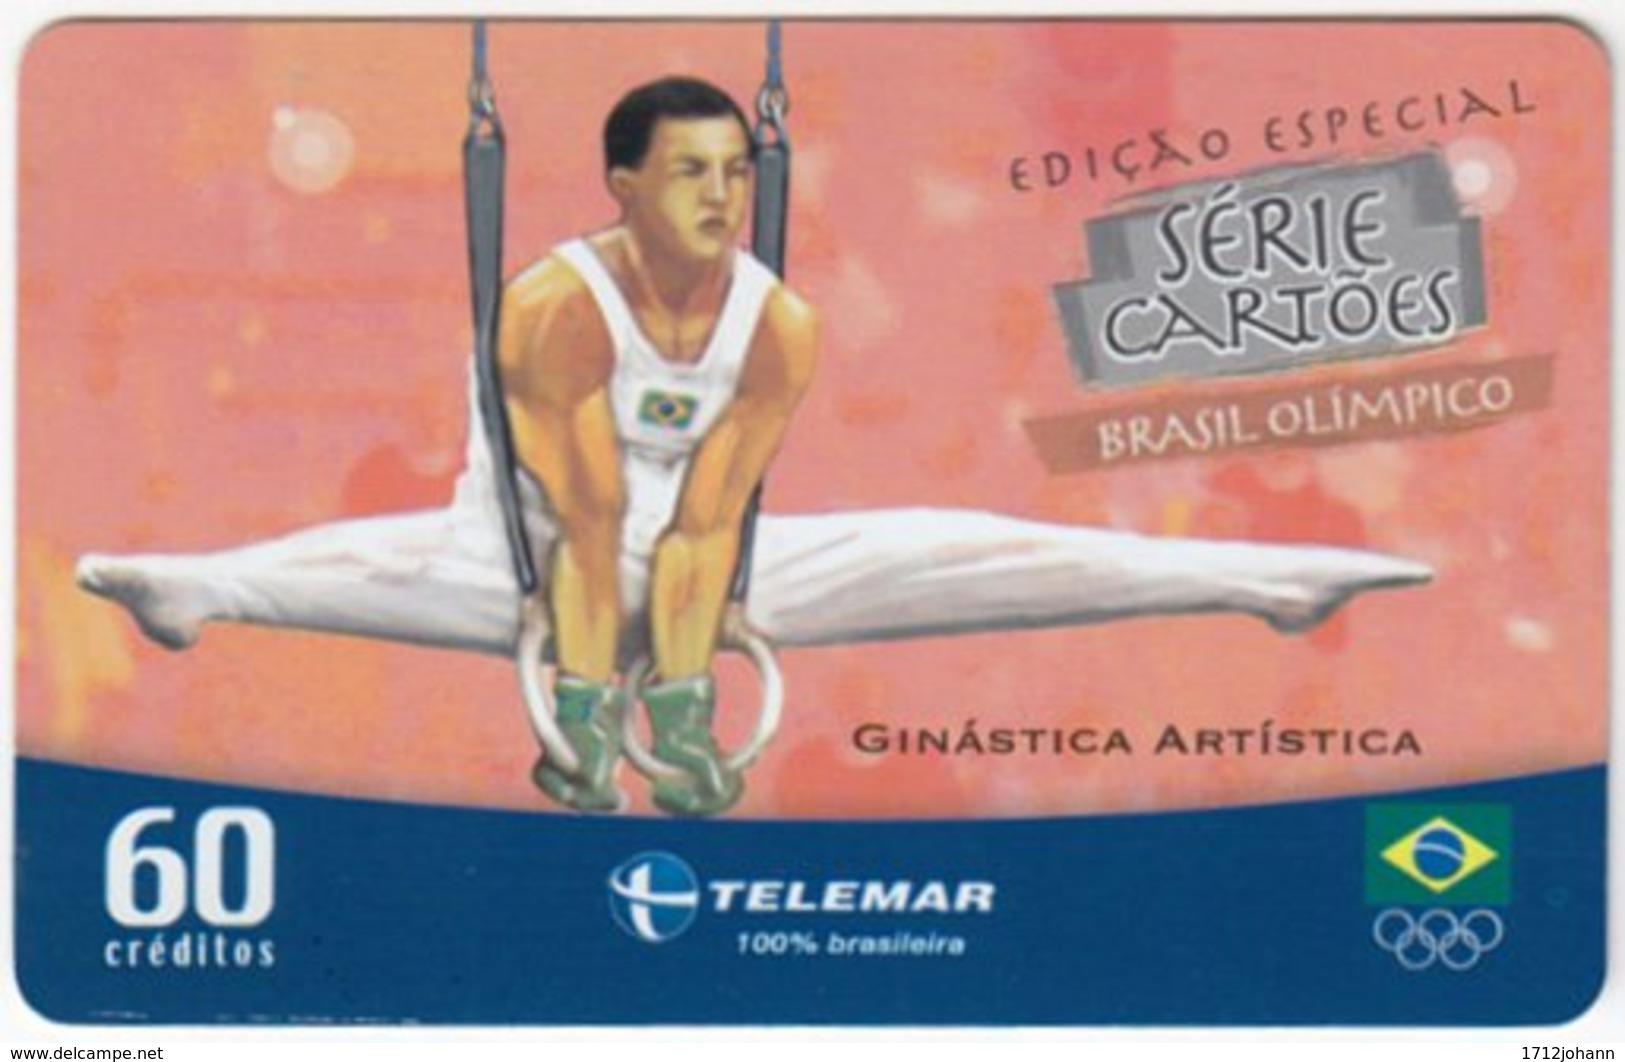 BRASIL G-443 Magnetic Telemar - Event, Olympic Games, Gymnastics - Used - Brasilien